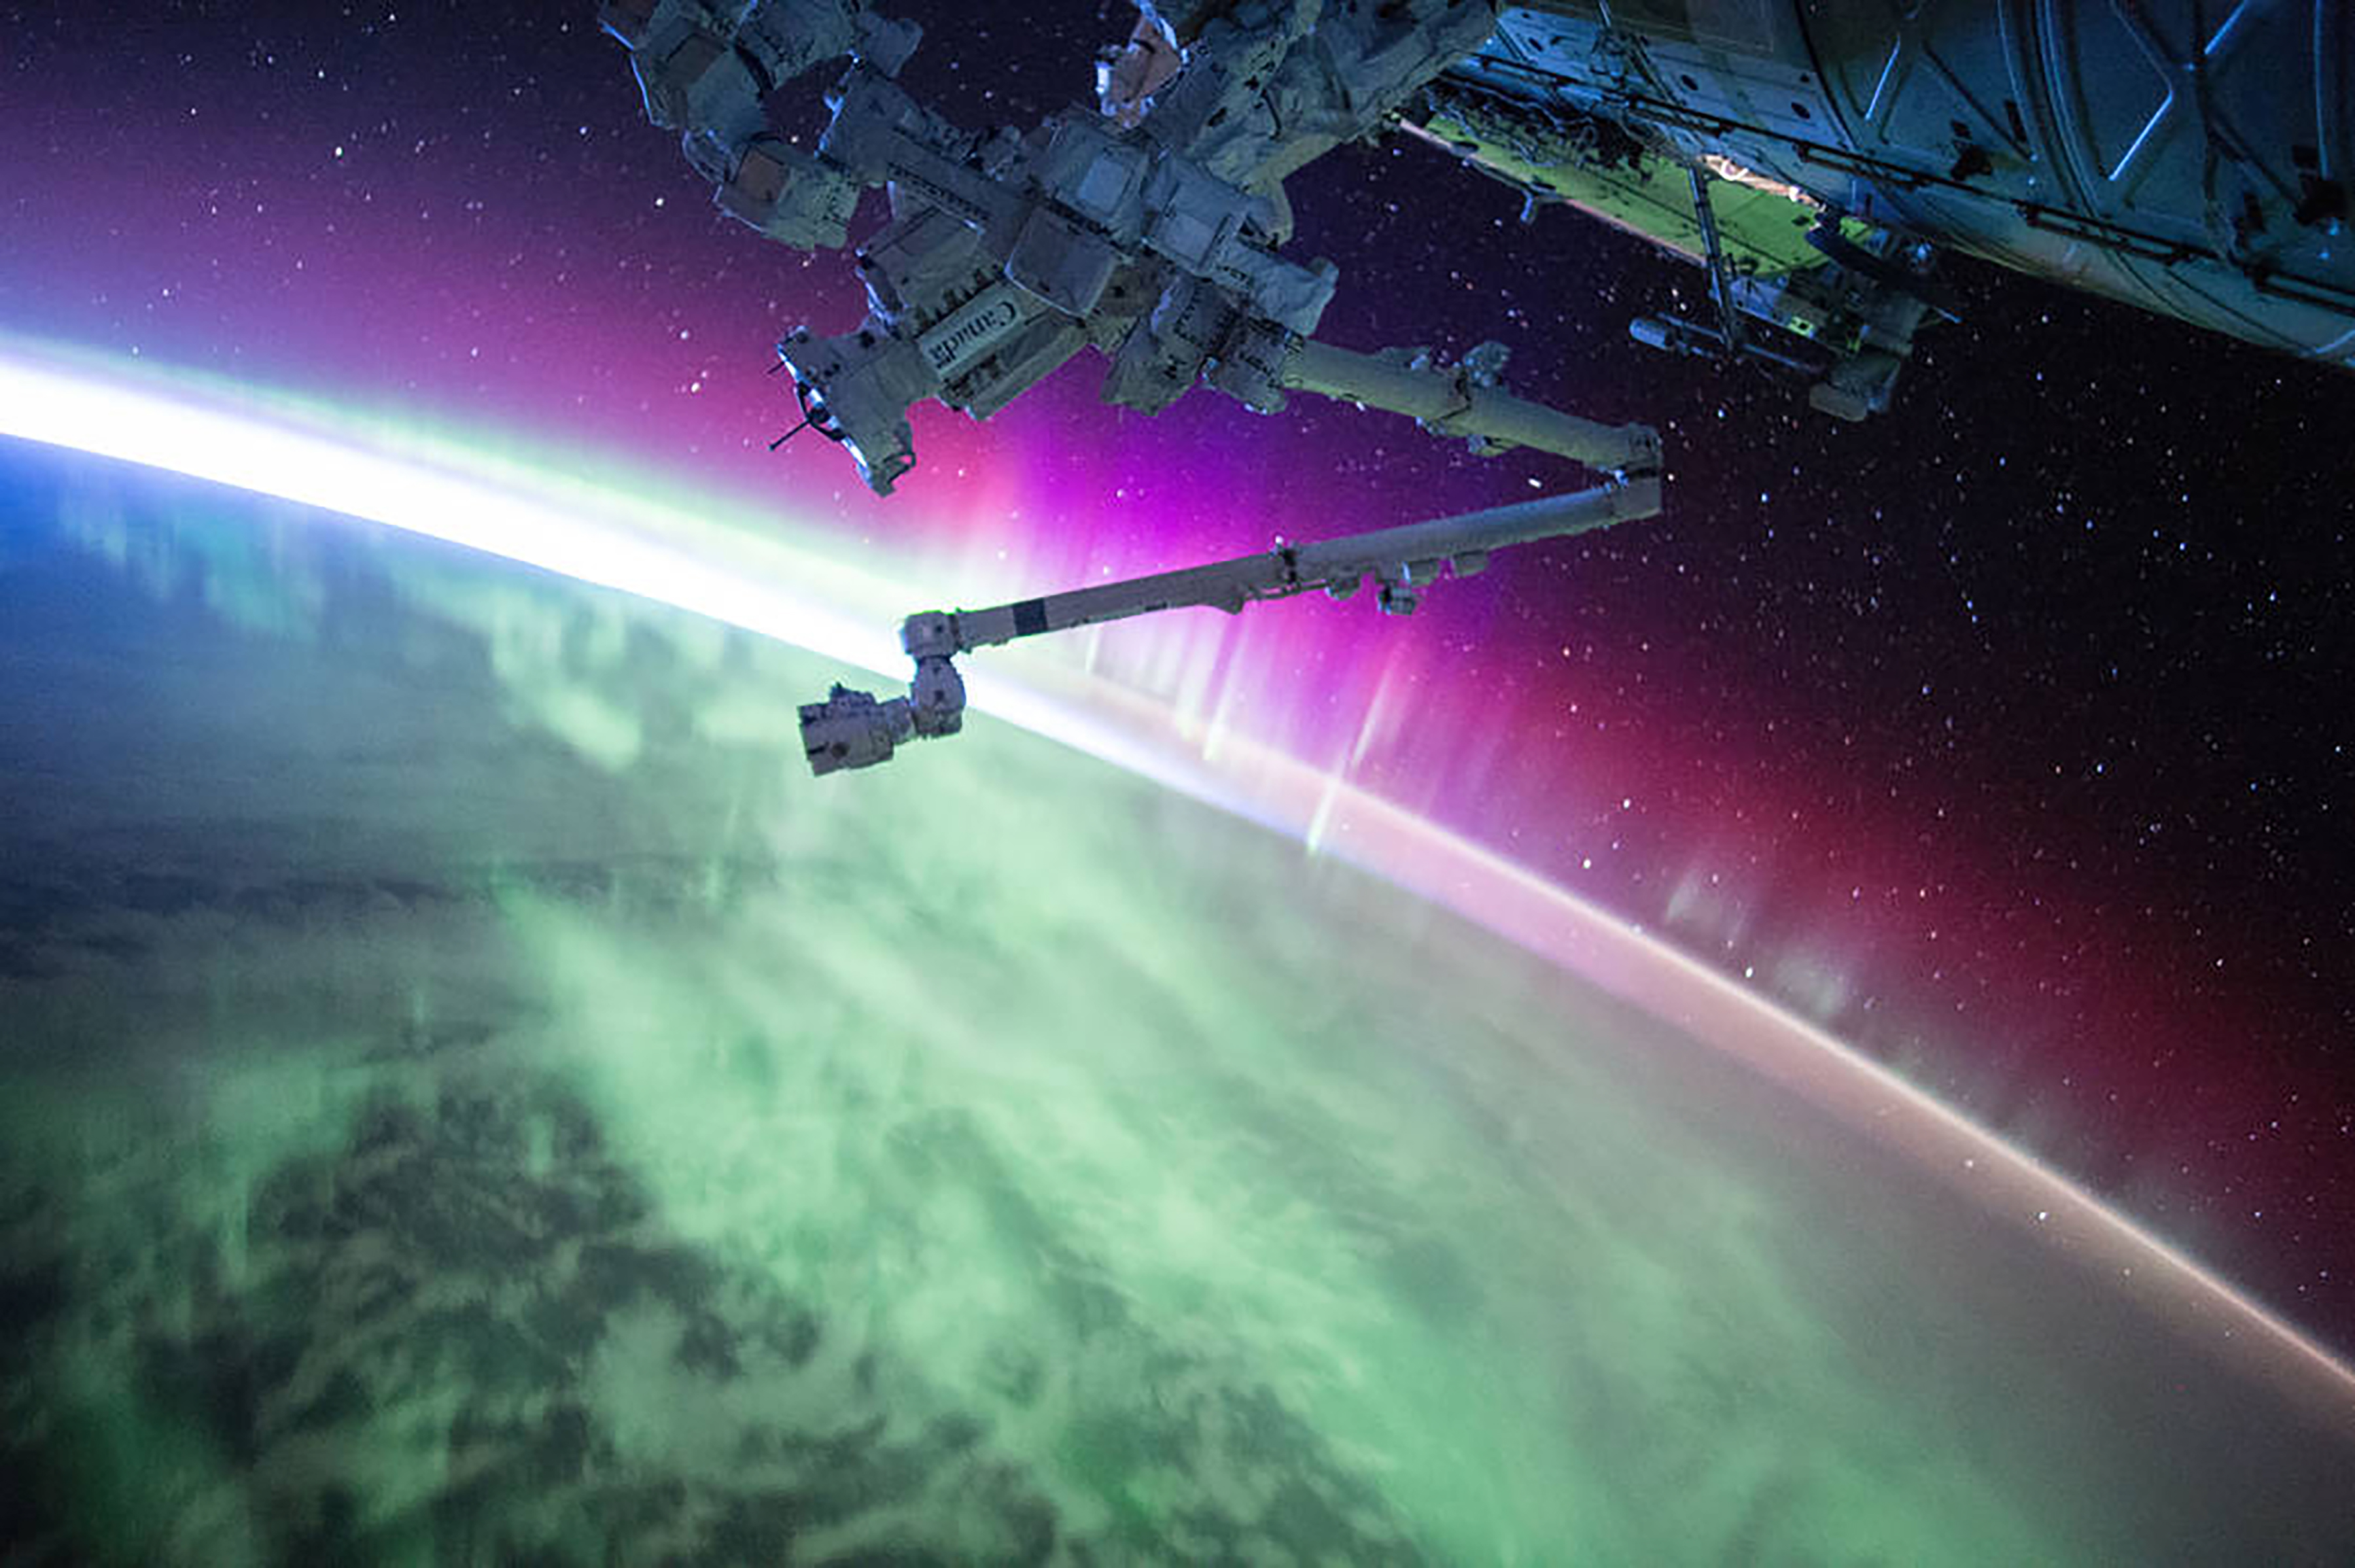 La aurora, captada en agosto de 2015 (Scott Kelly/NASA via The New York Times)